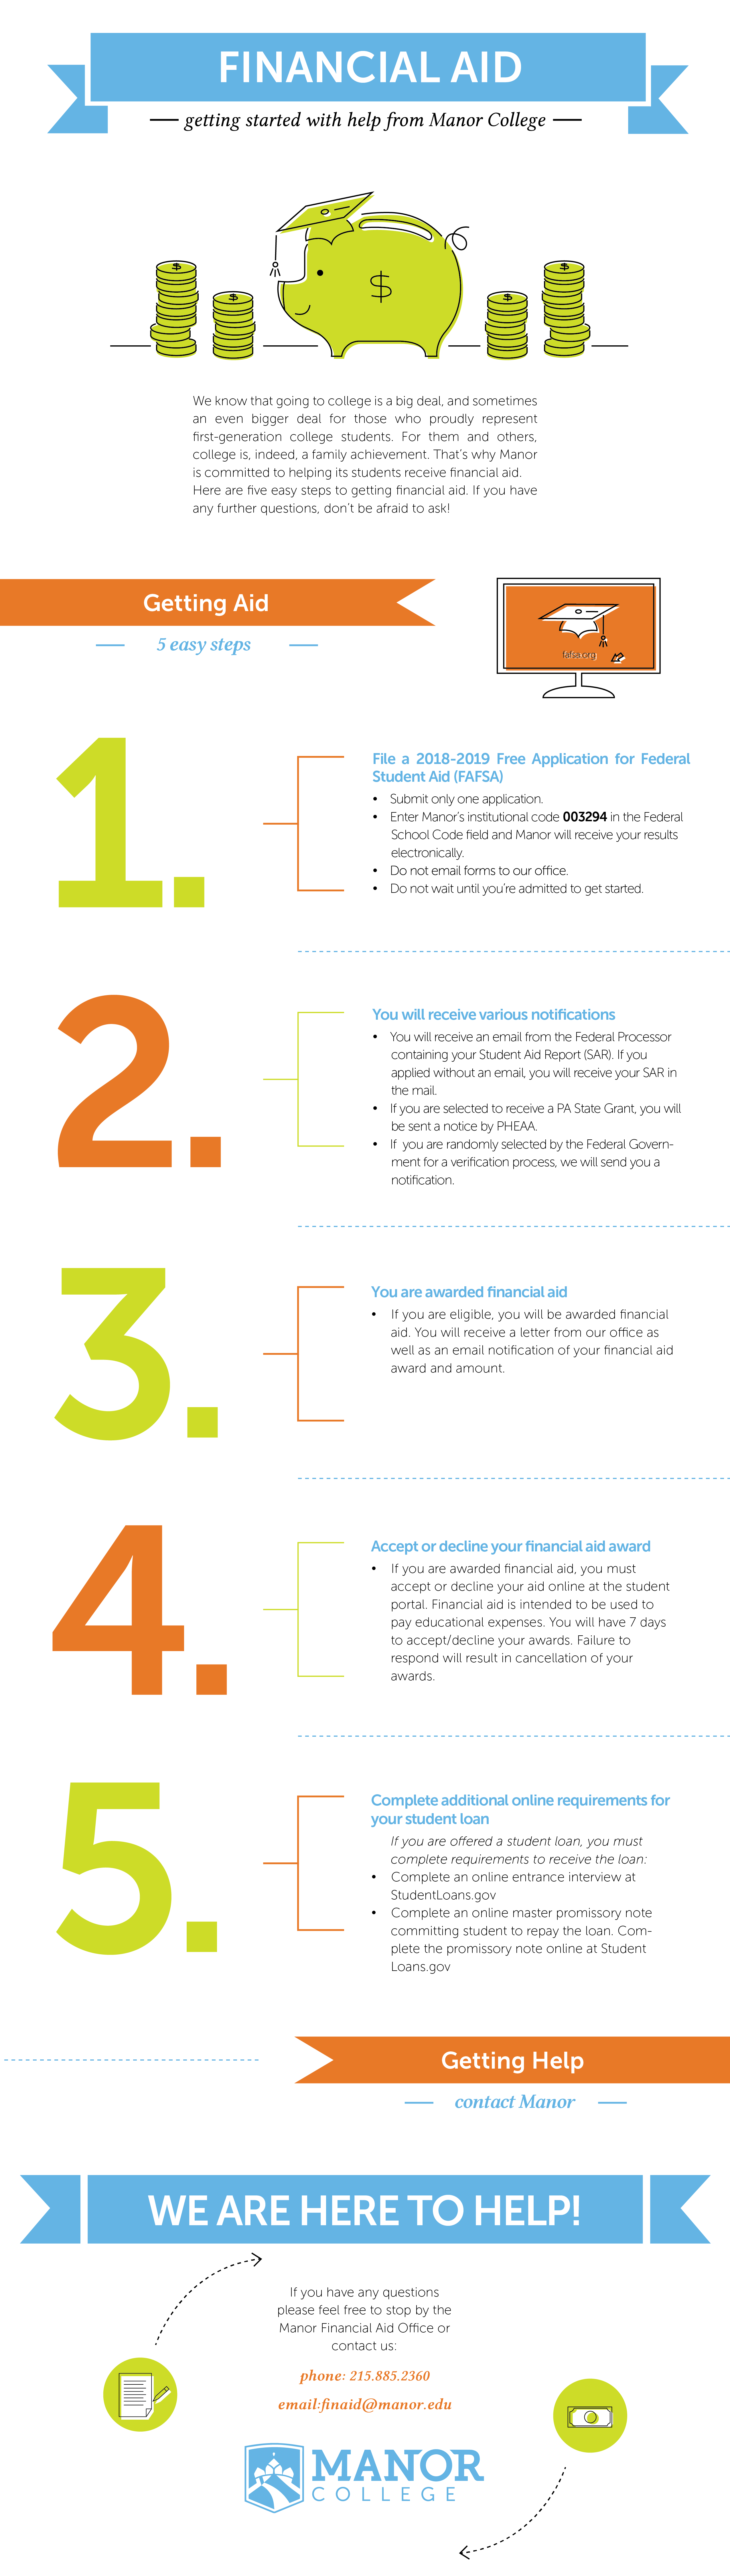 Financial Aid Application Checklist